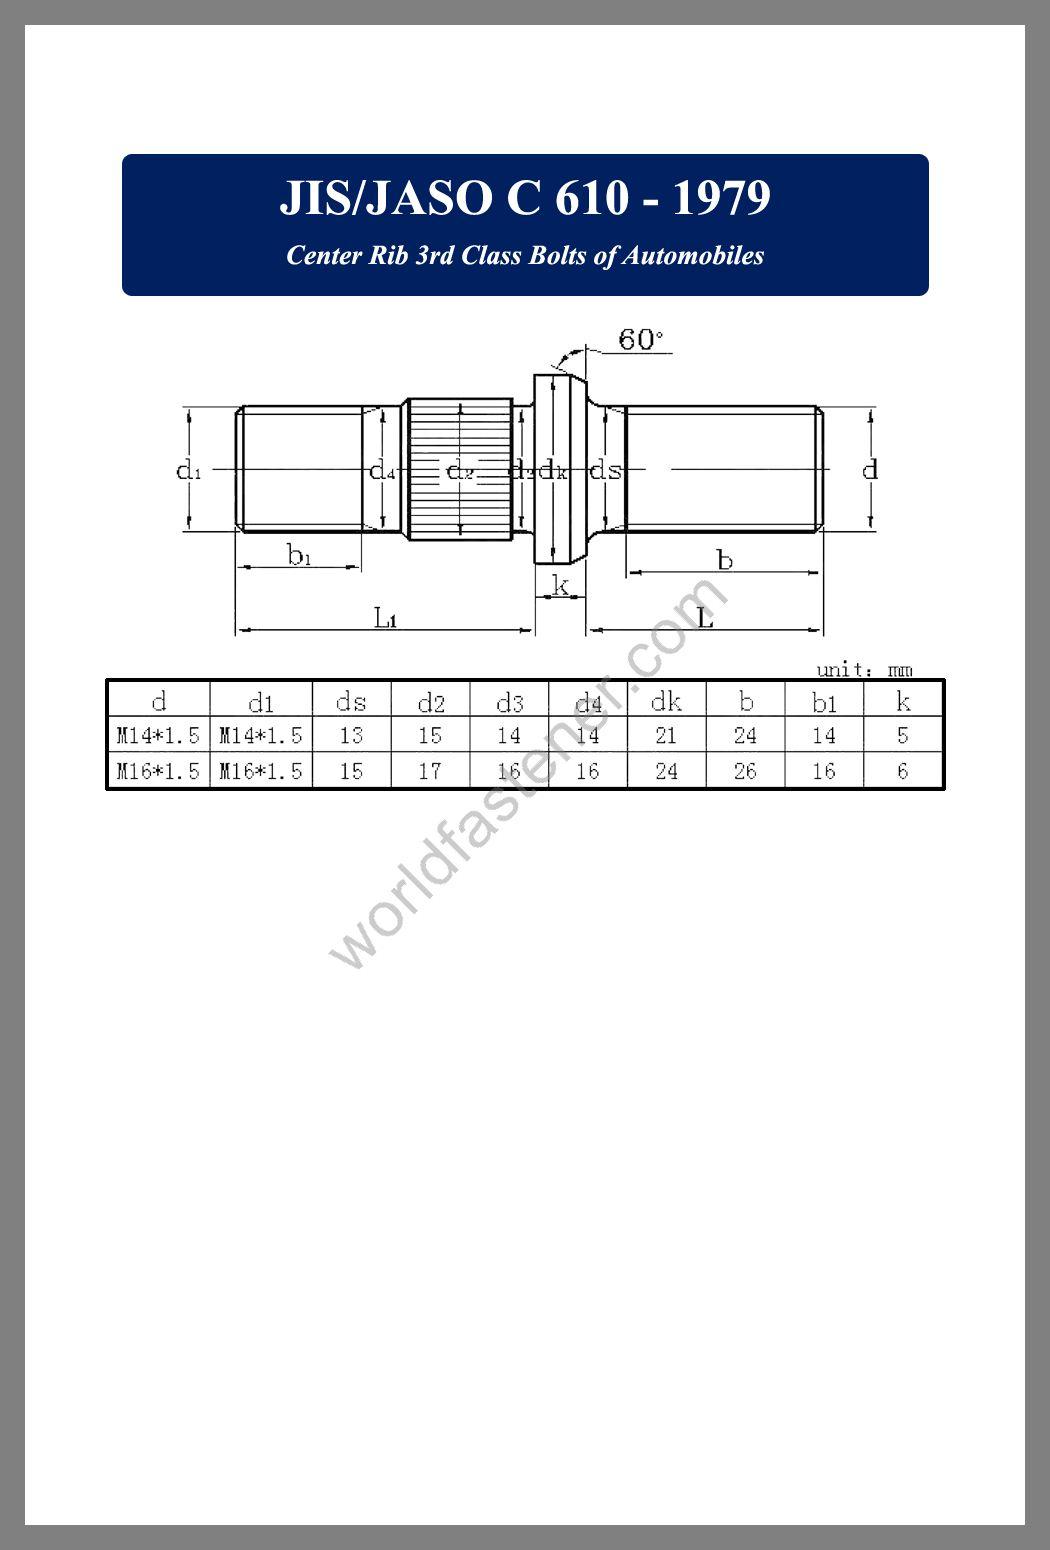 JIS -JASO C610, JIS -JASO C610 Center Rib, Wheel bolt, Wheel nut, fastener, screw, bolt